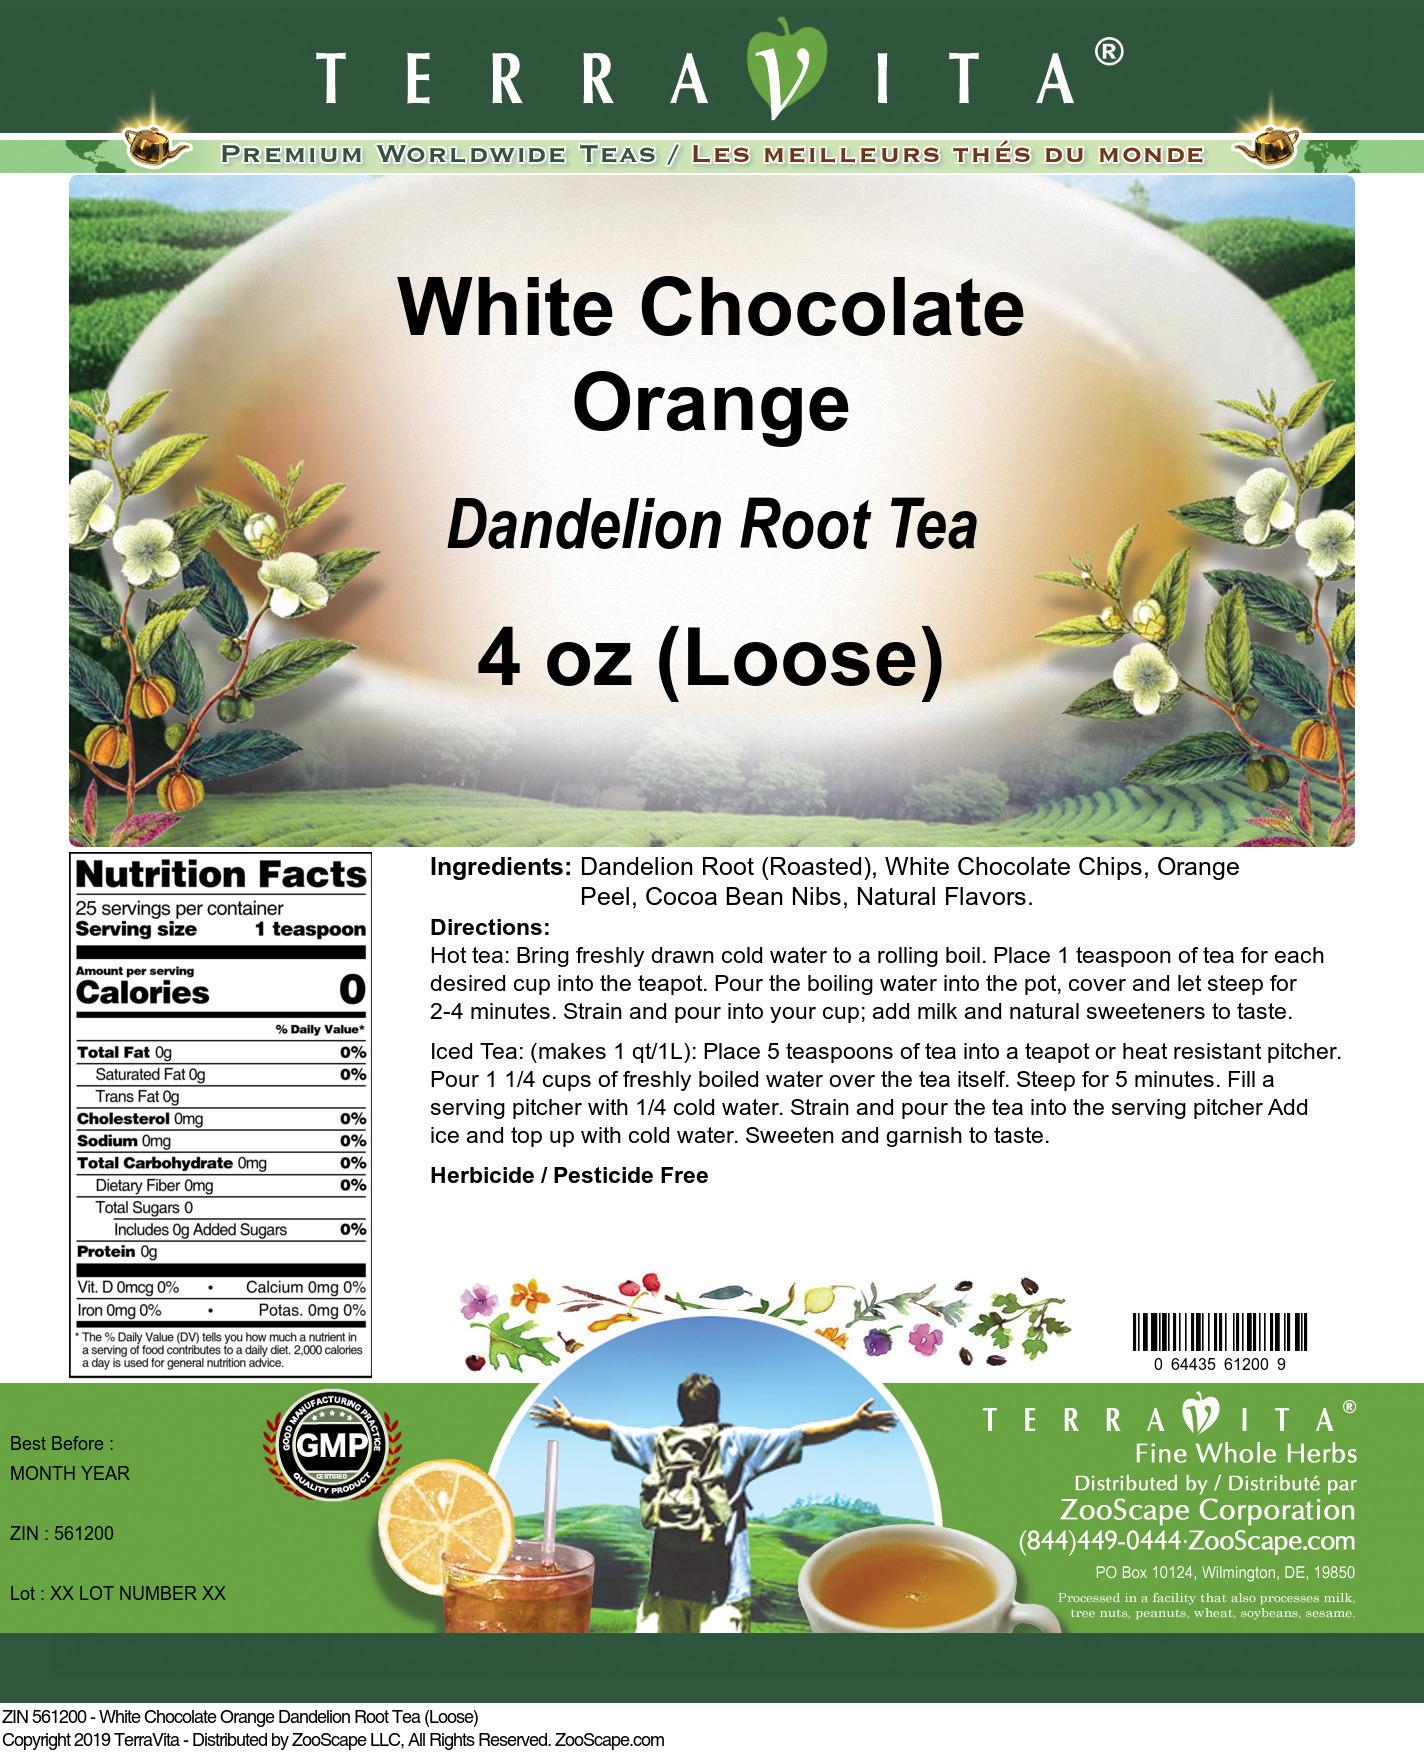 White Chocolate Orange Dandelion Root